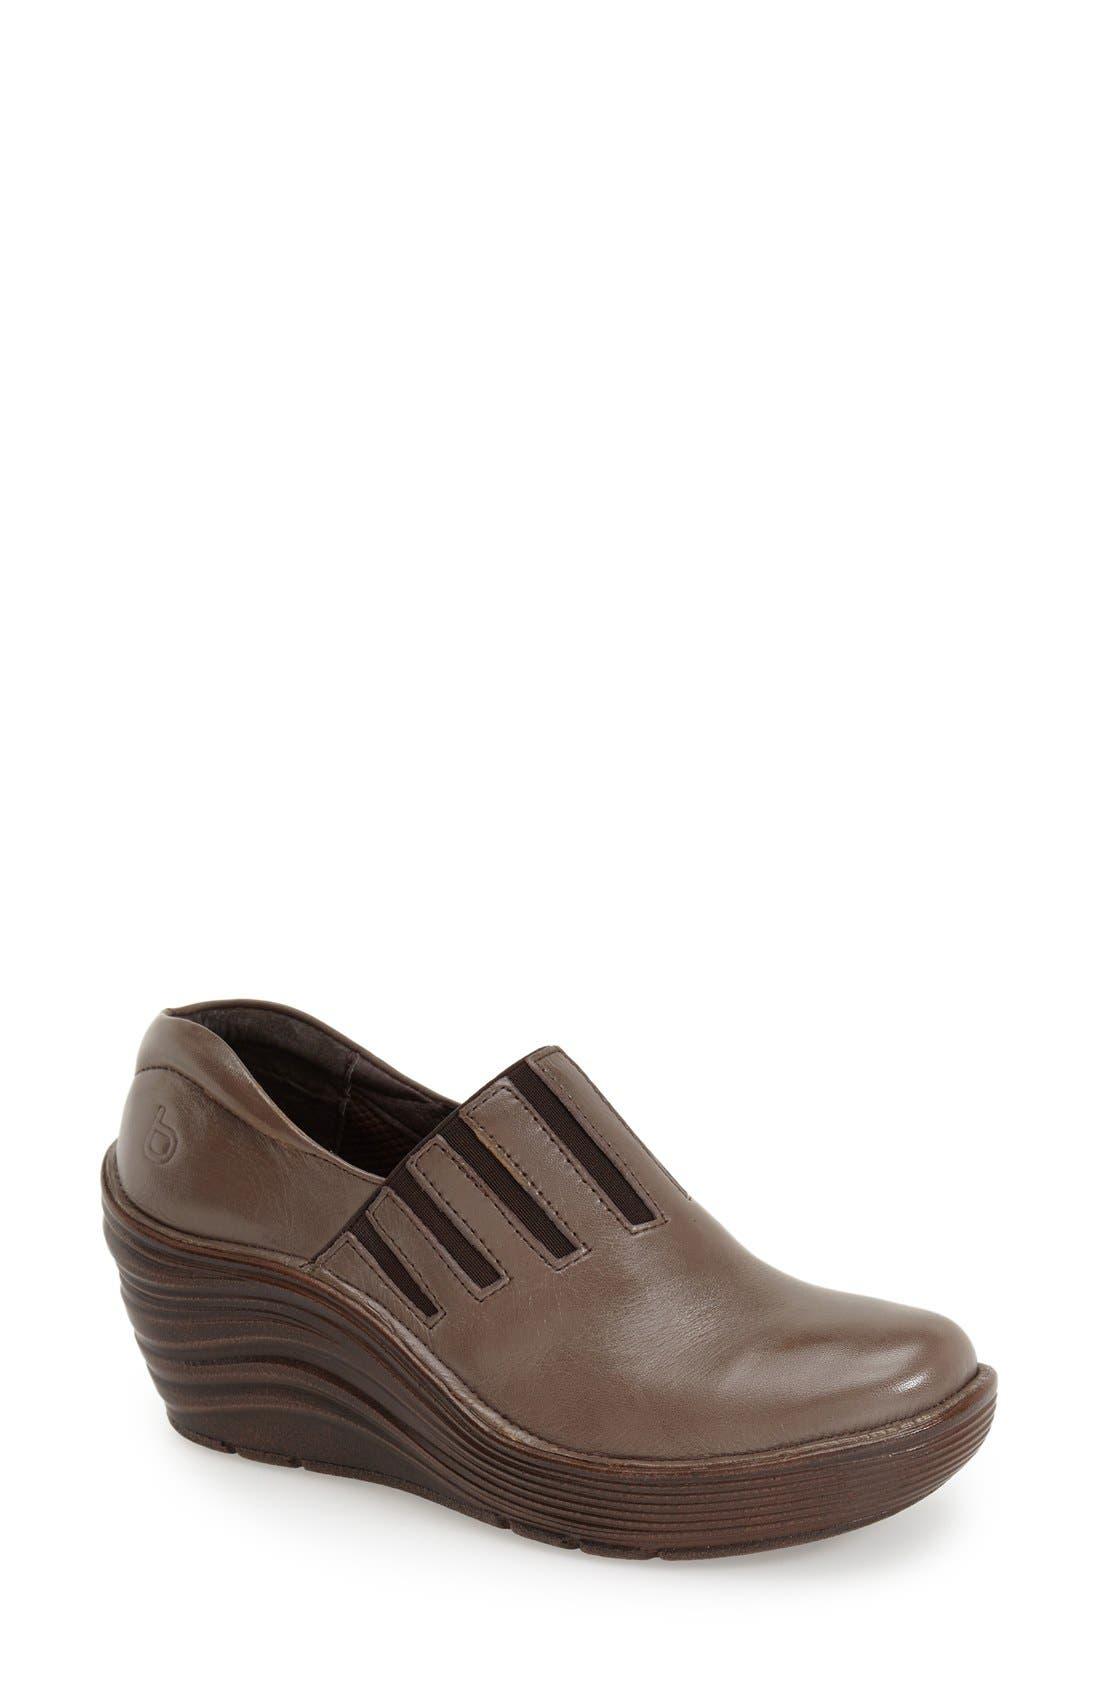 'Coast' Clog,                         Main,                         color, Taupe Grey Leather